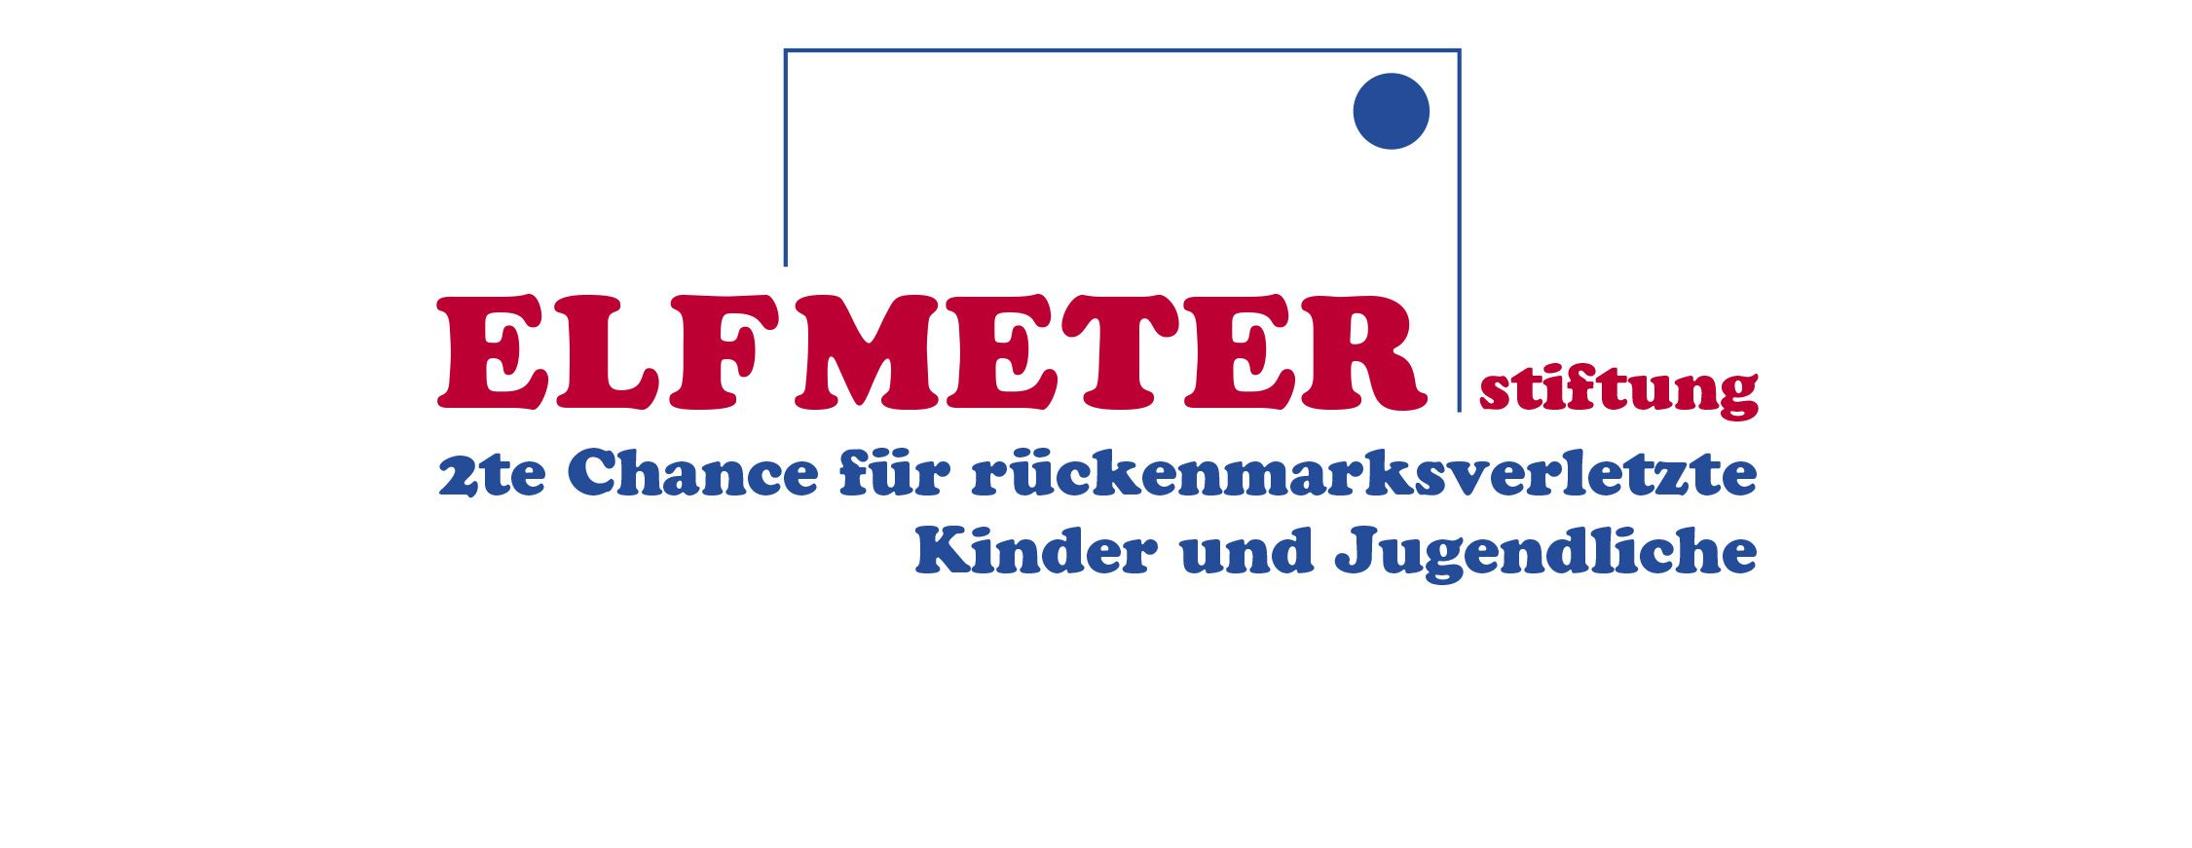 Elfmeter Stiftung Logo